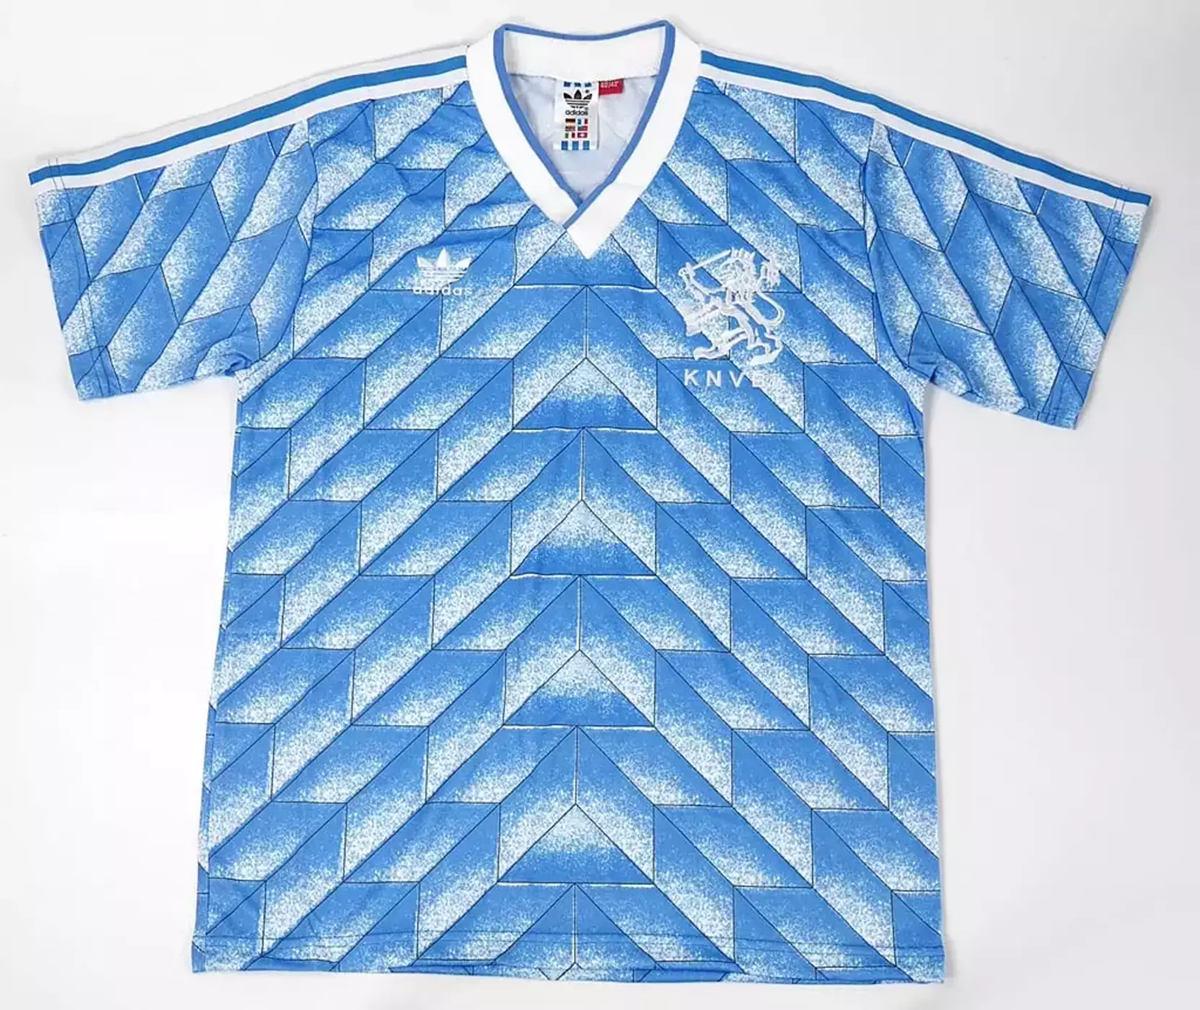 Netherlands 1988-90 Away Retro Soccer Jersey - shootjerseys